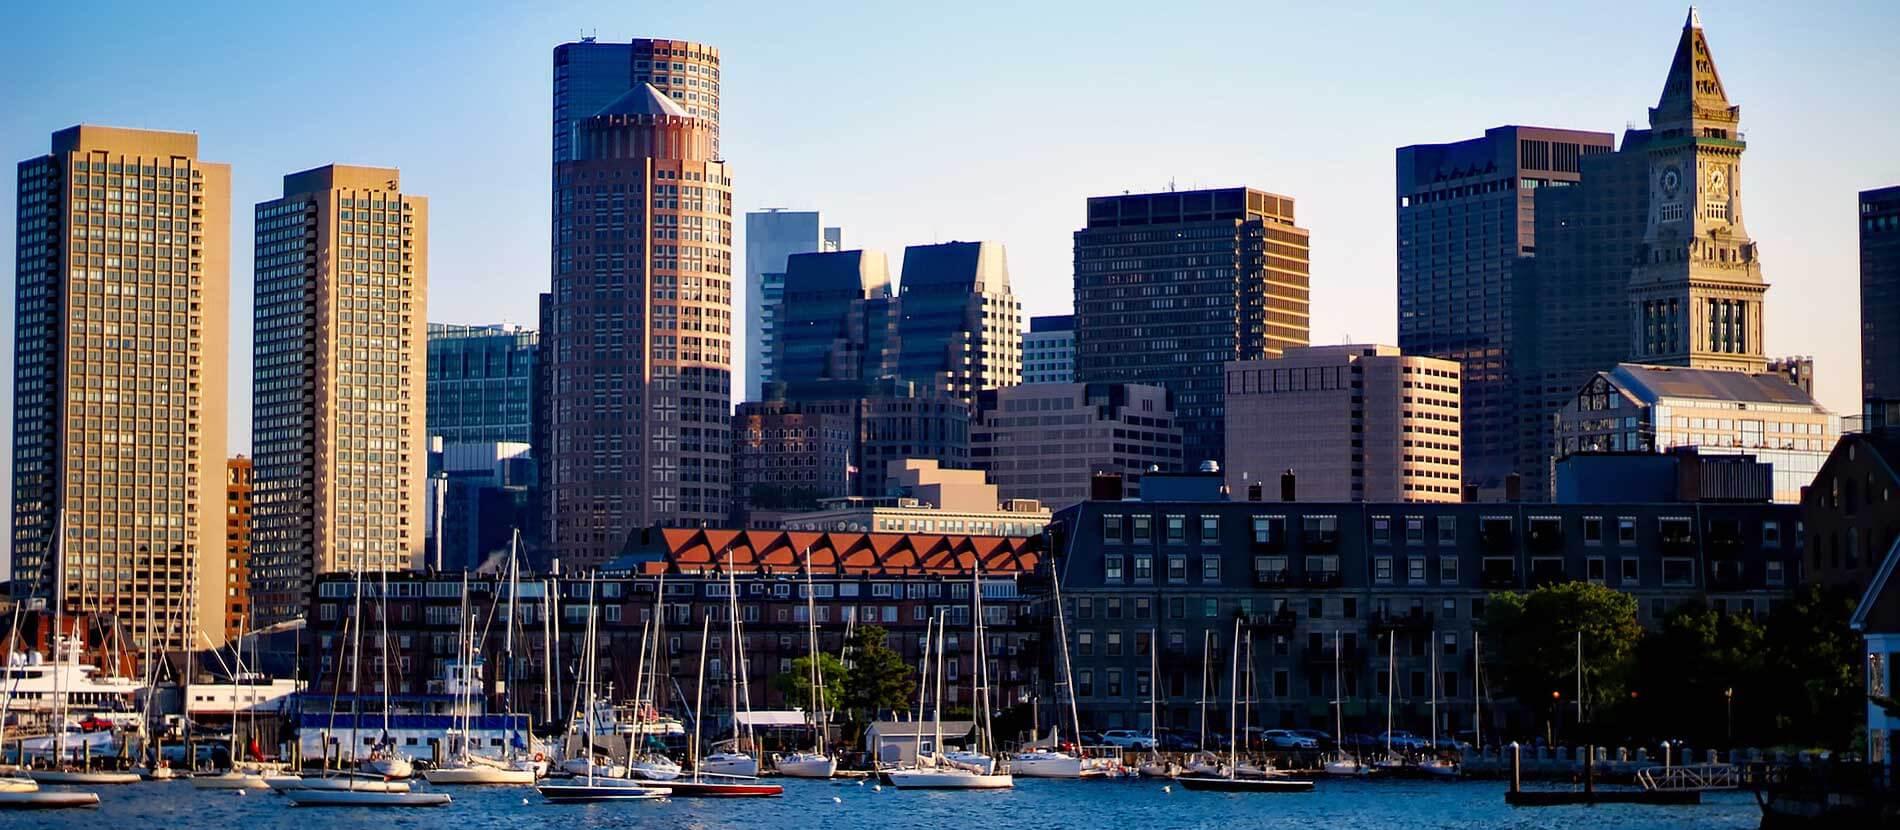 curso-de-ingles-para-adultos-Boston-Pine-Manor-Kings-ASTEX